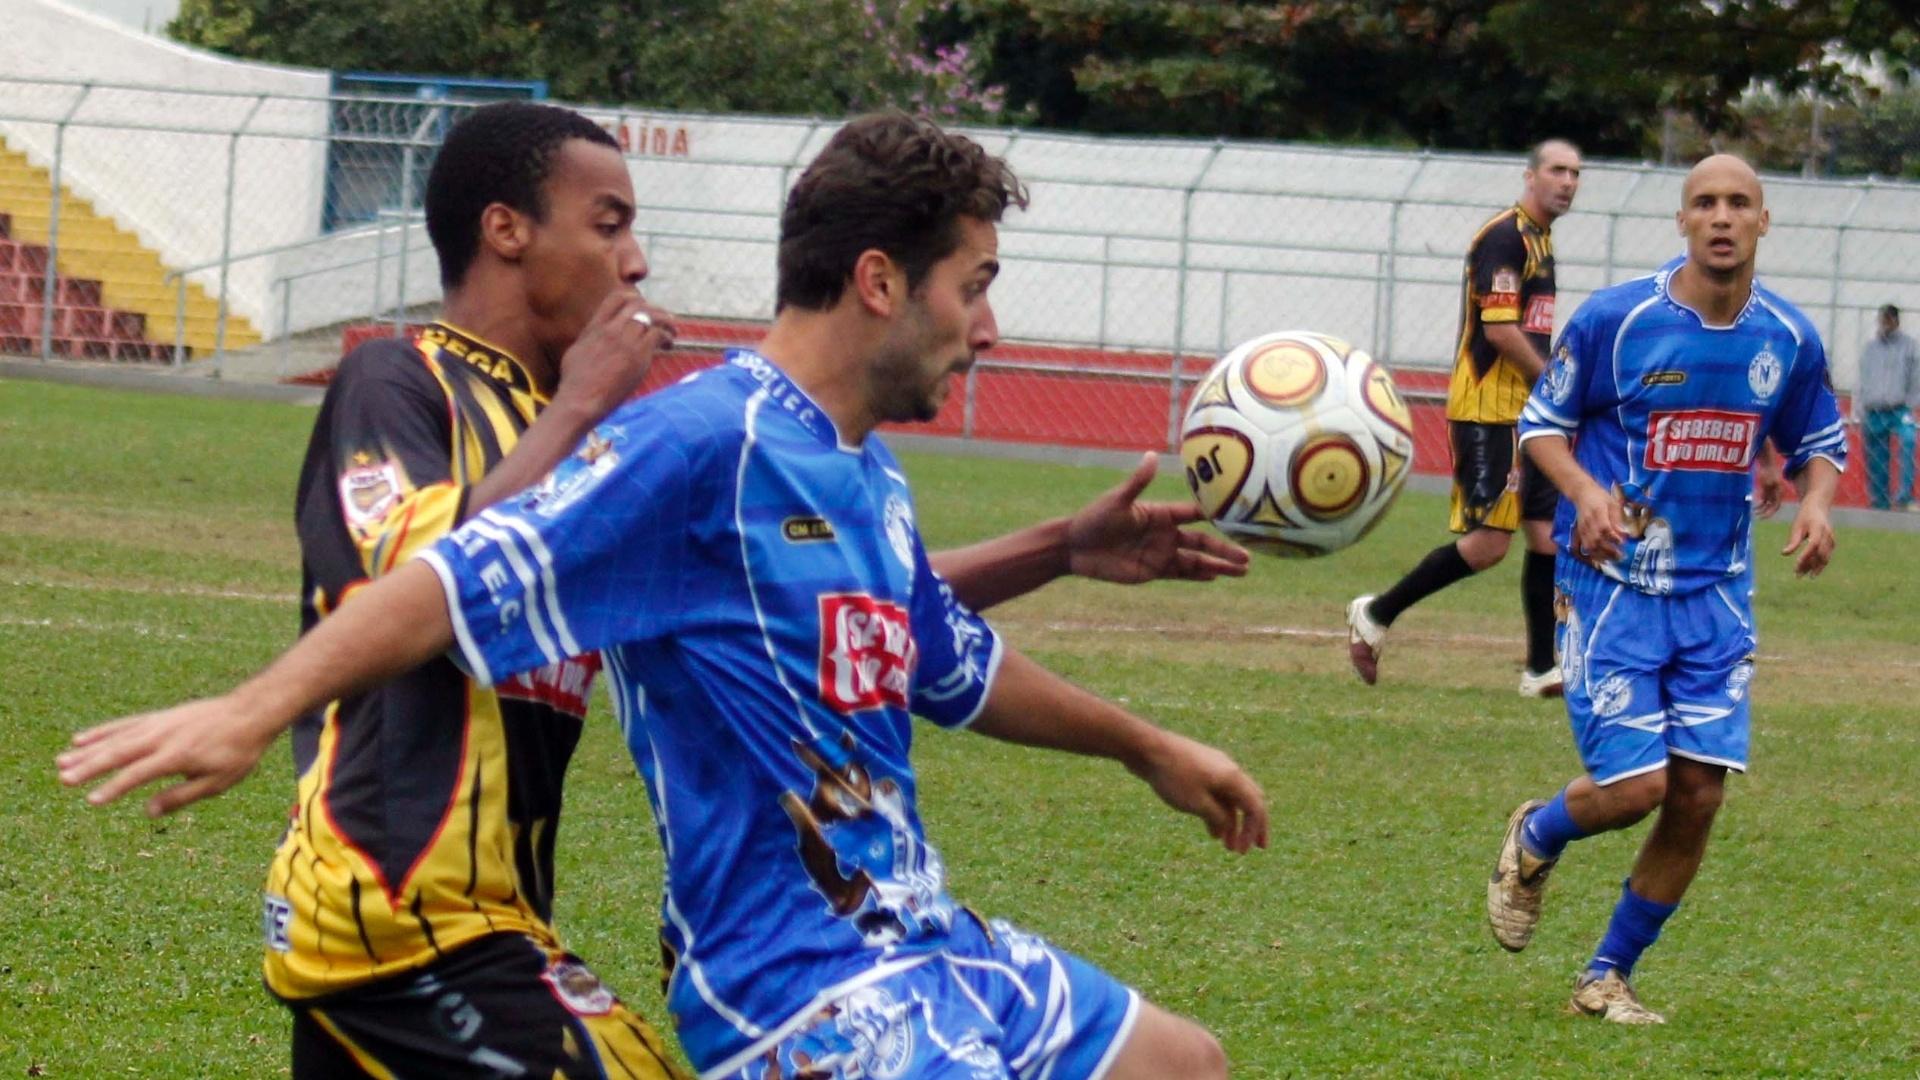 Partida entre Adega (amarelo) 1 X 2 Napoli (azul)